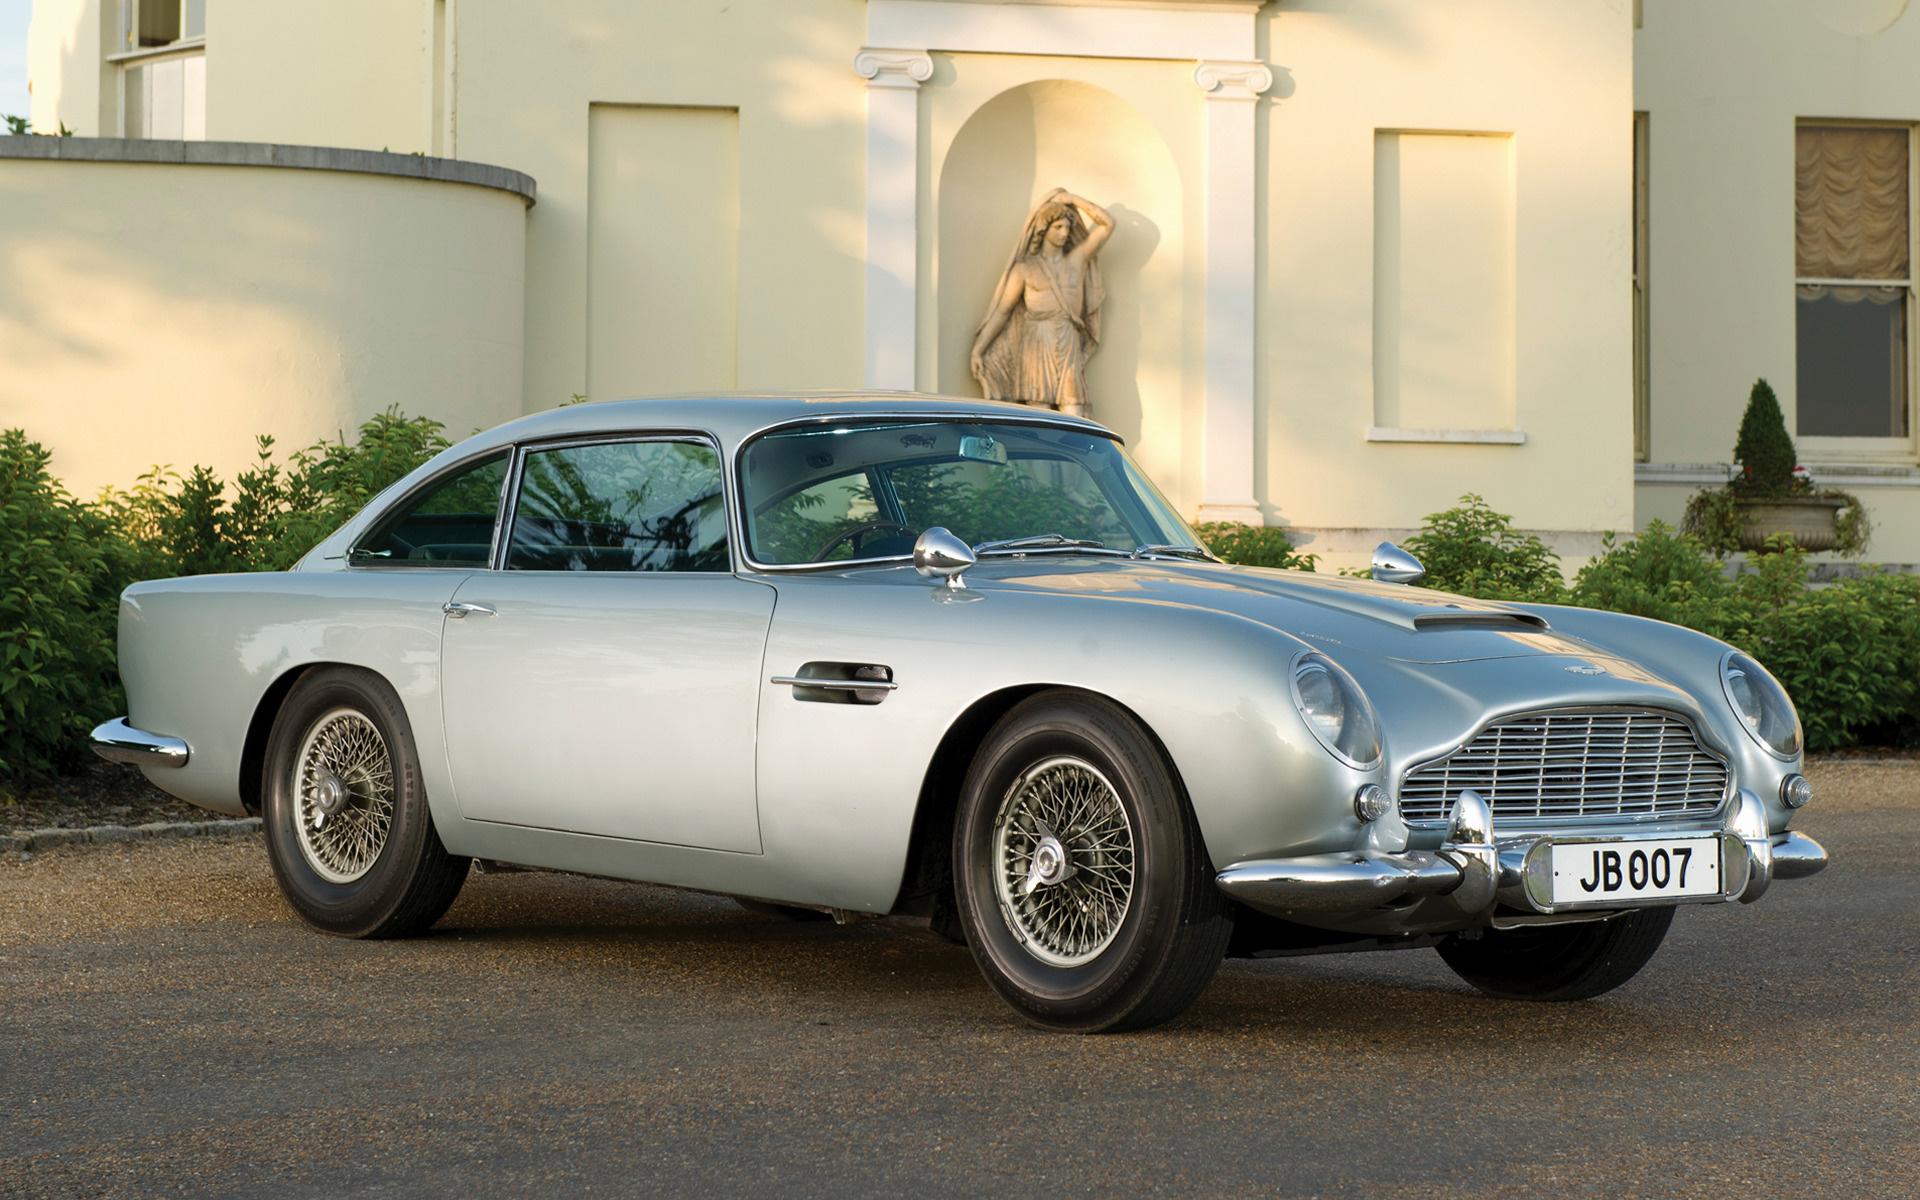 Aston Martin DB5 James Bond Edition (1964) Wallpapers and ...